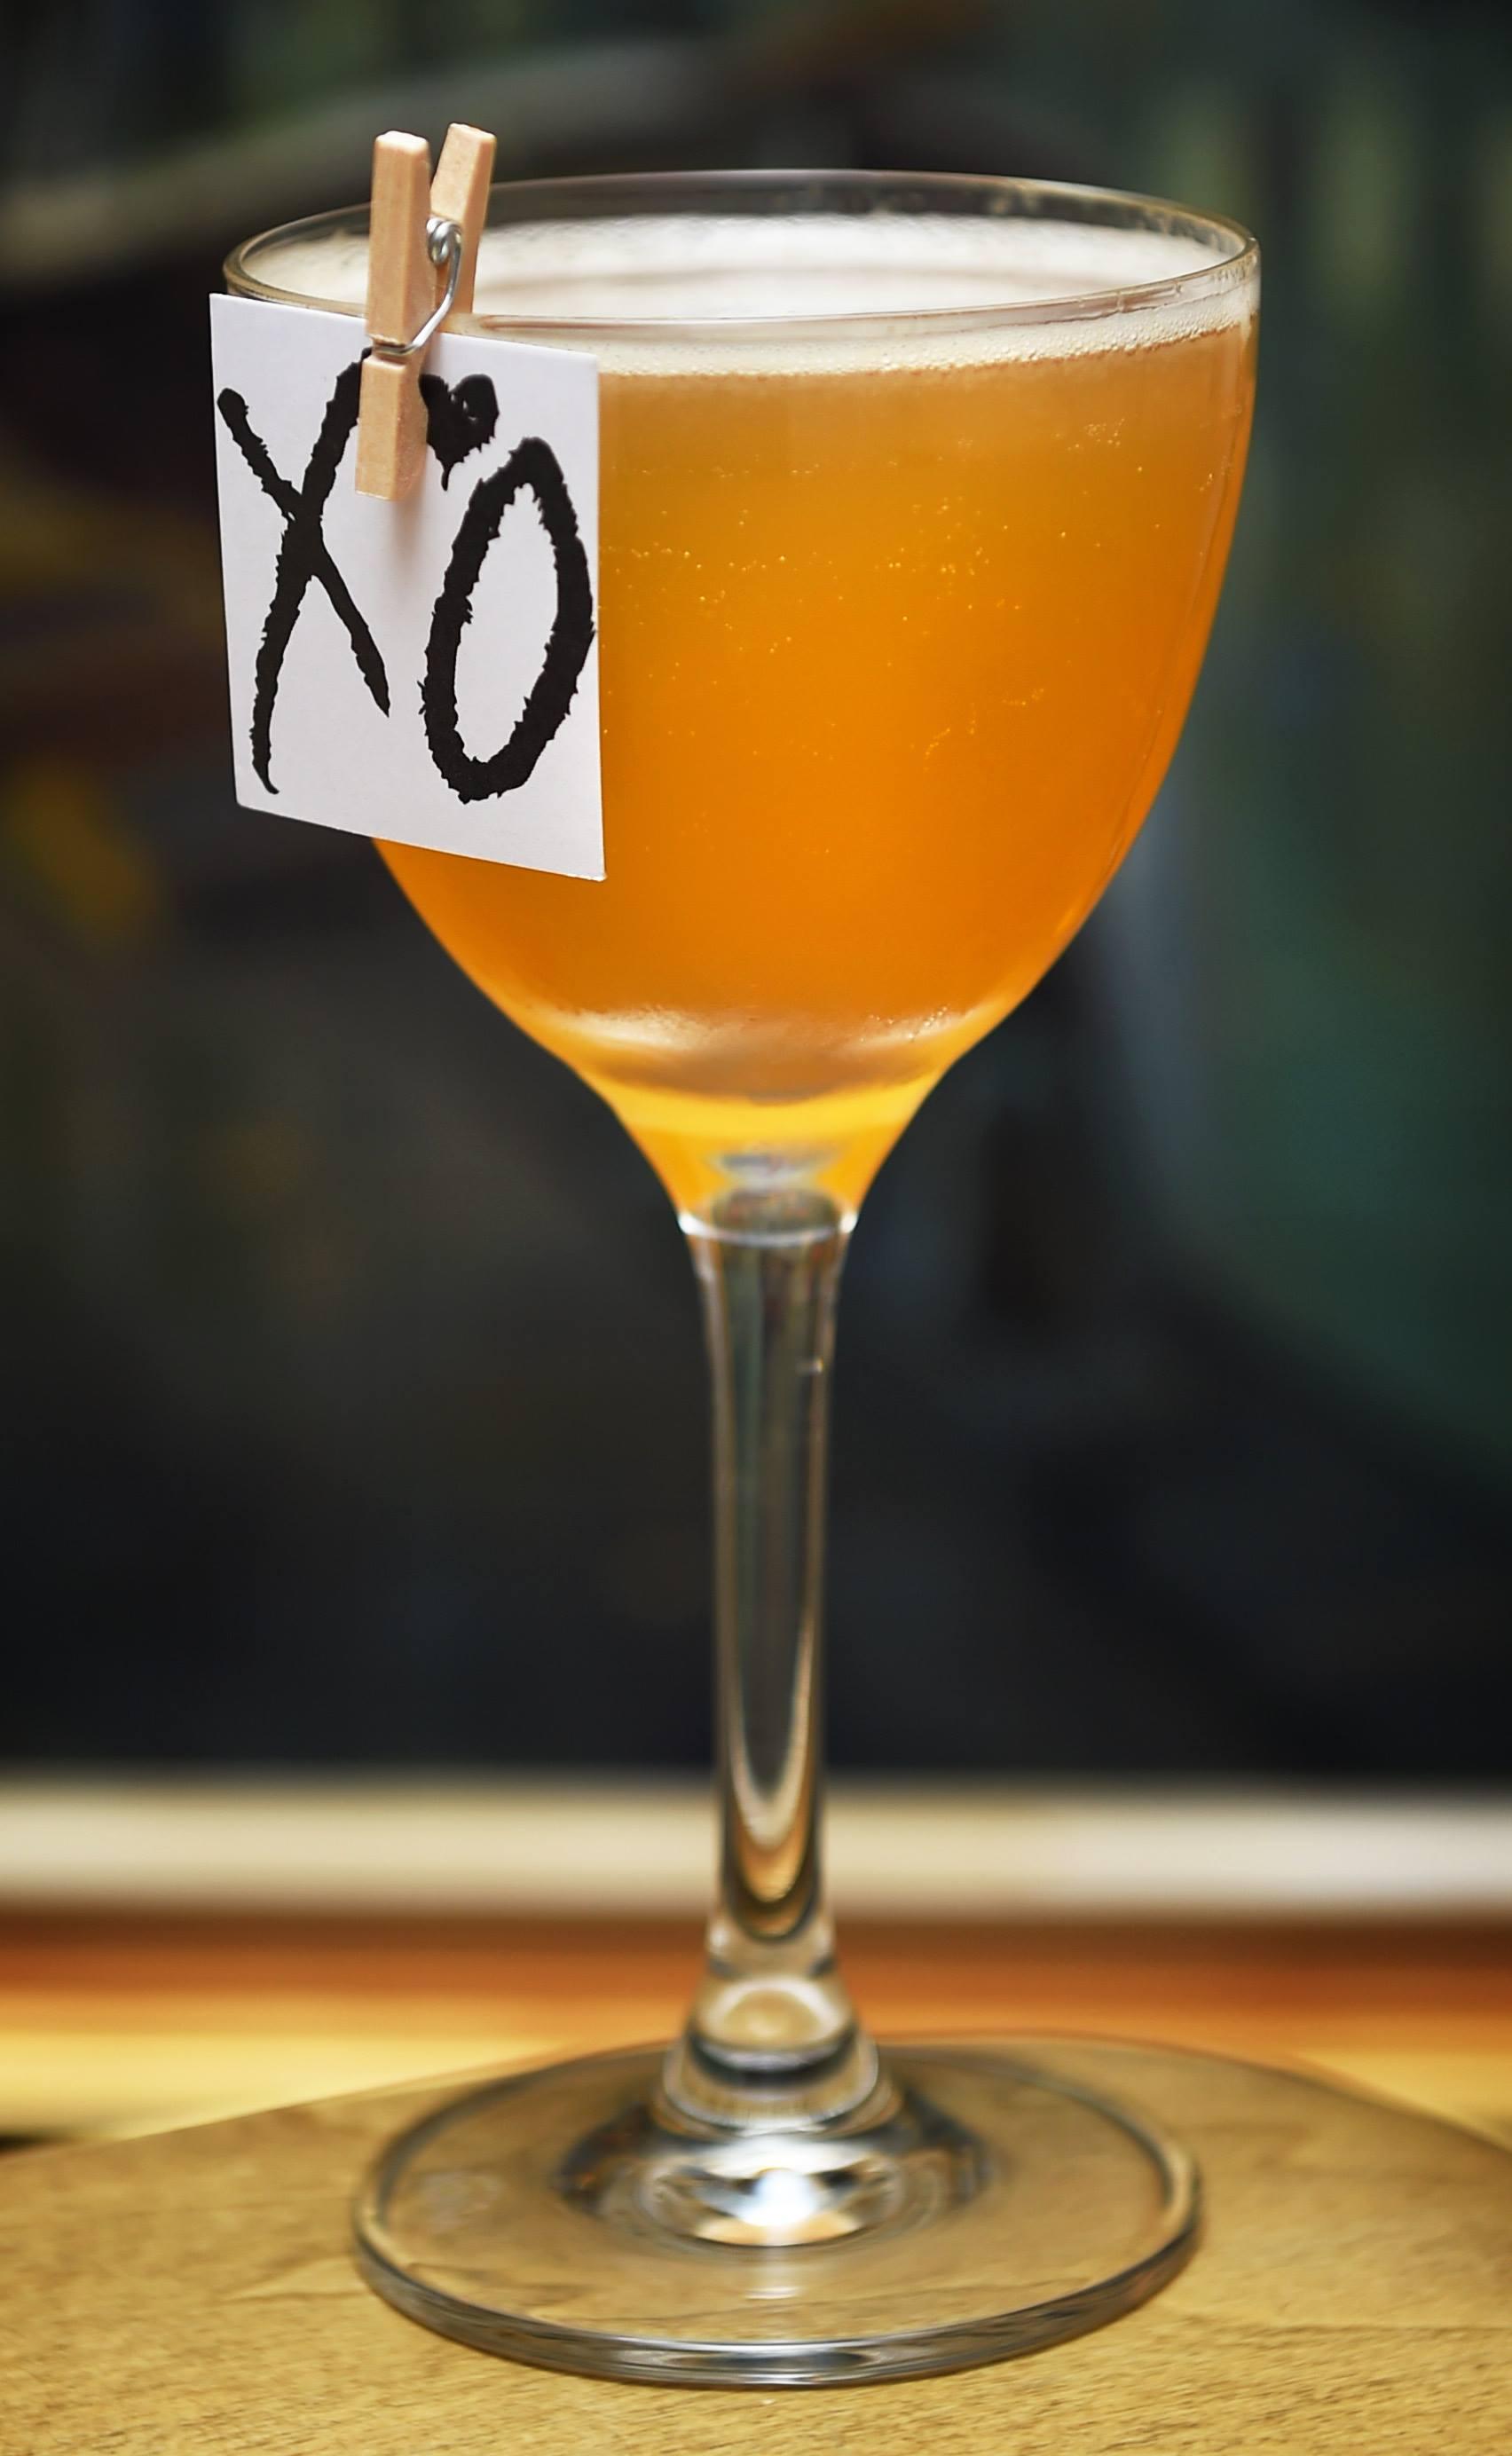 XO cognac based cocktail from Kester Thomas cocktail bar in Copenhagen